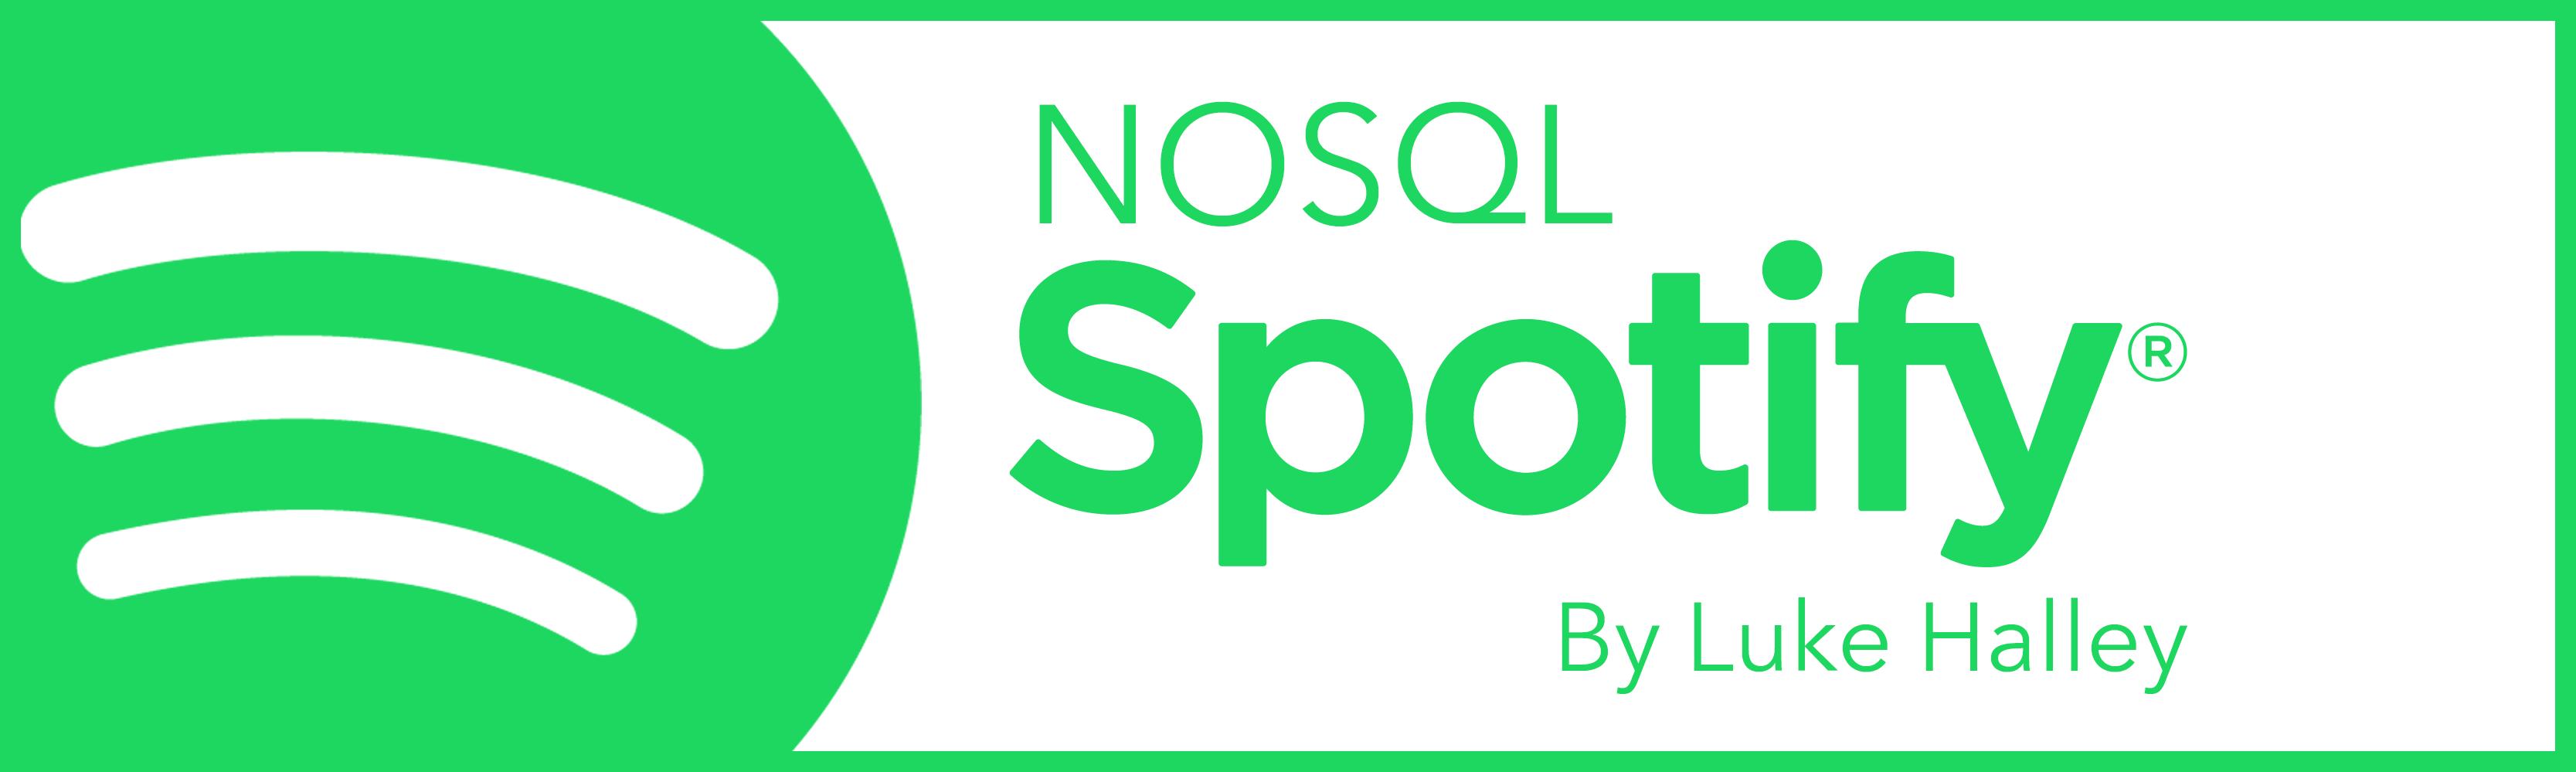 NoSQL-Spotify/readme md at master · lukehalley/NoSQL-Spotify